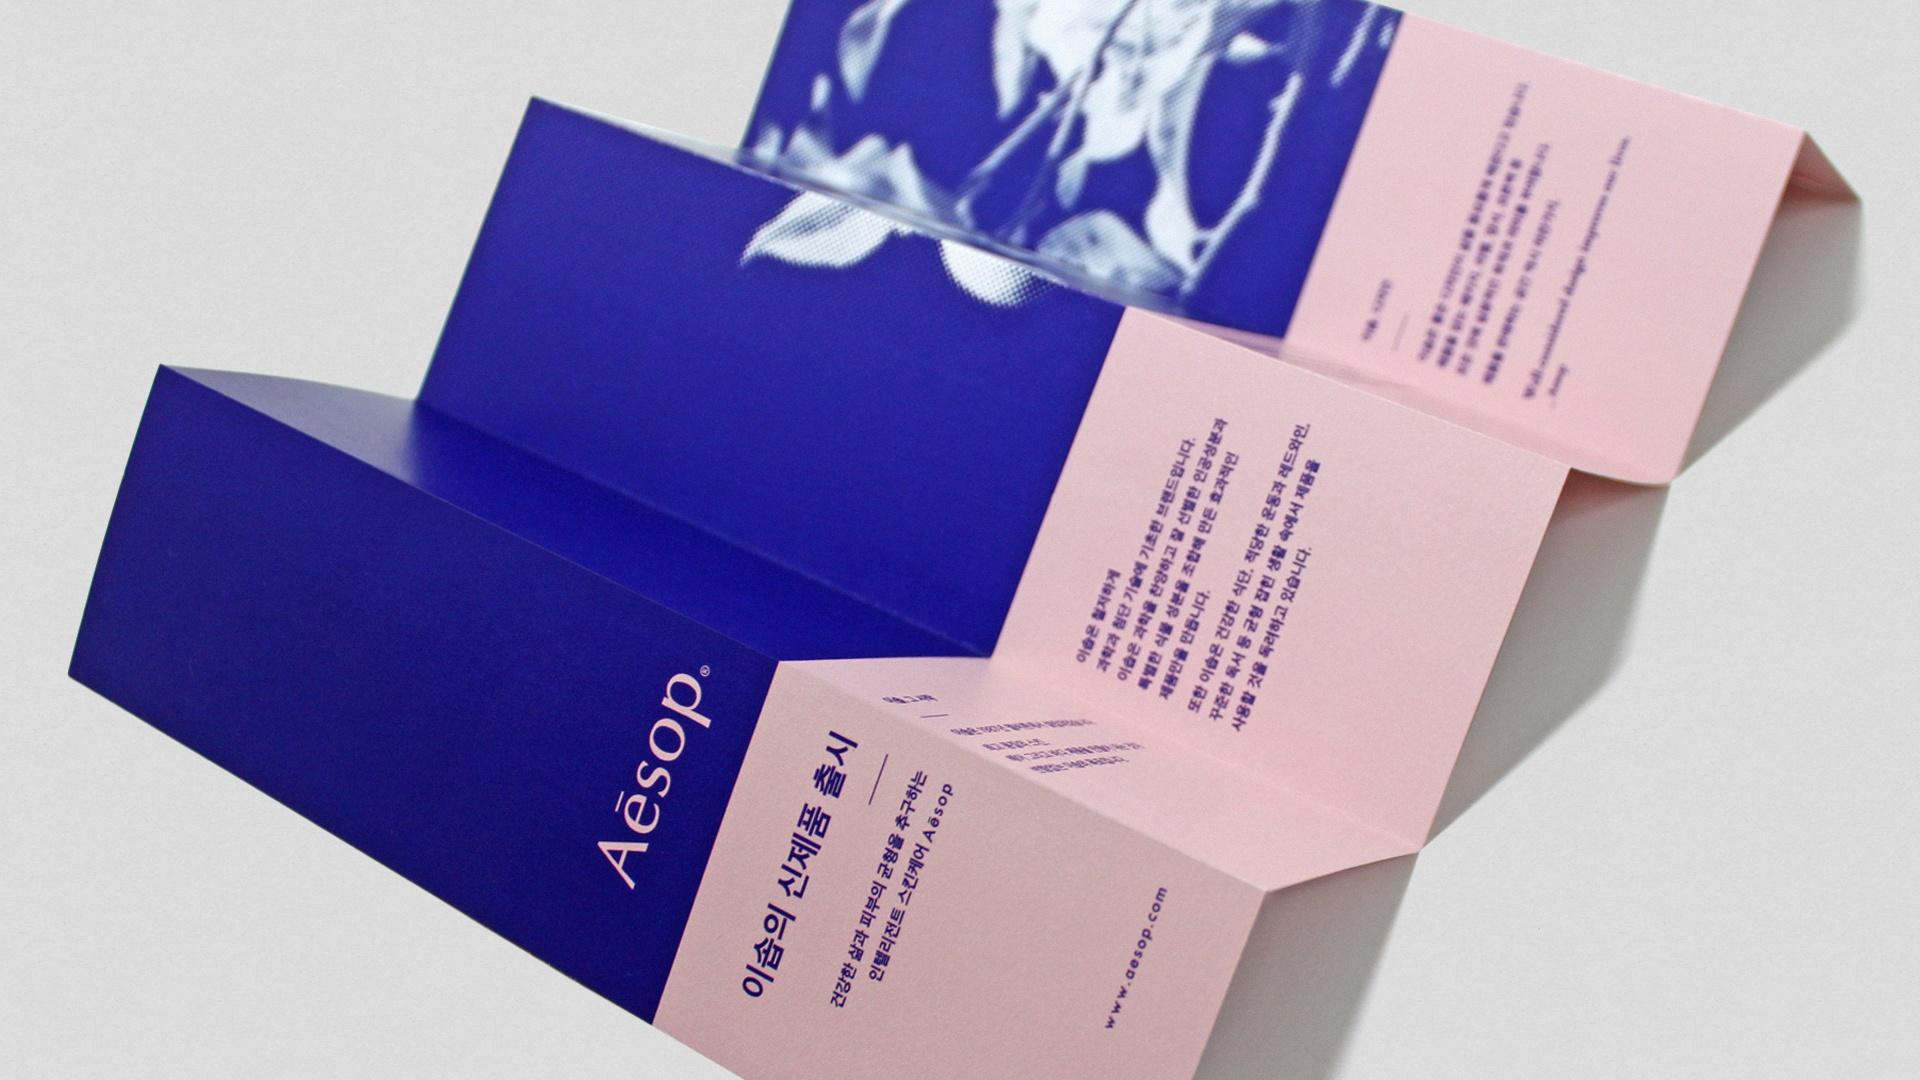 Aasop aesop reaflet - redesign - cha-yunkyung on behance